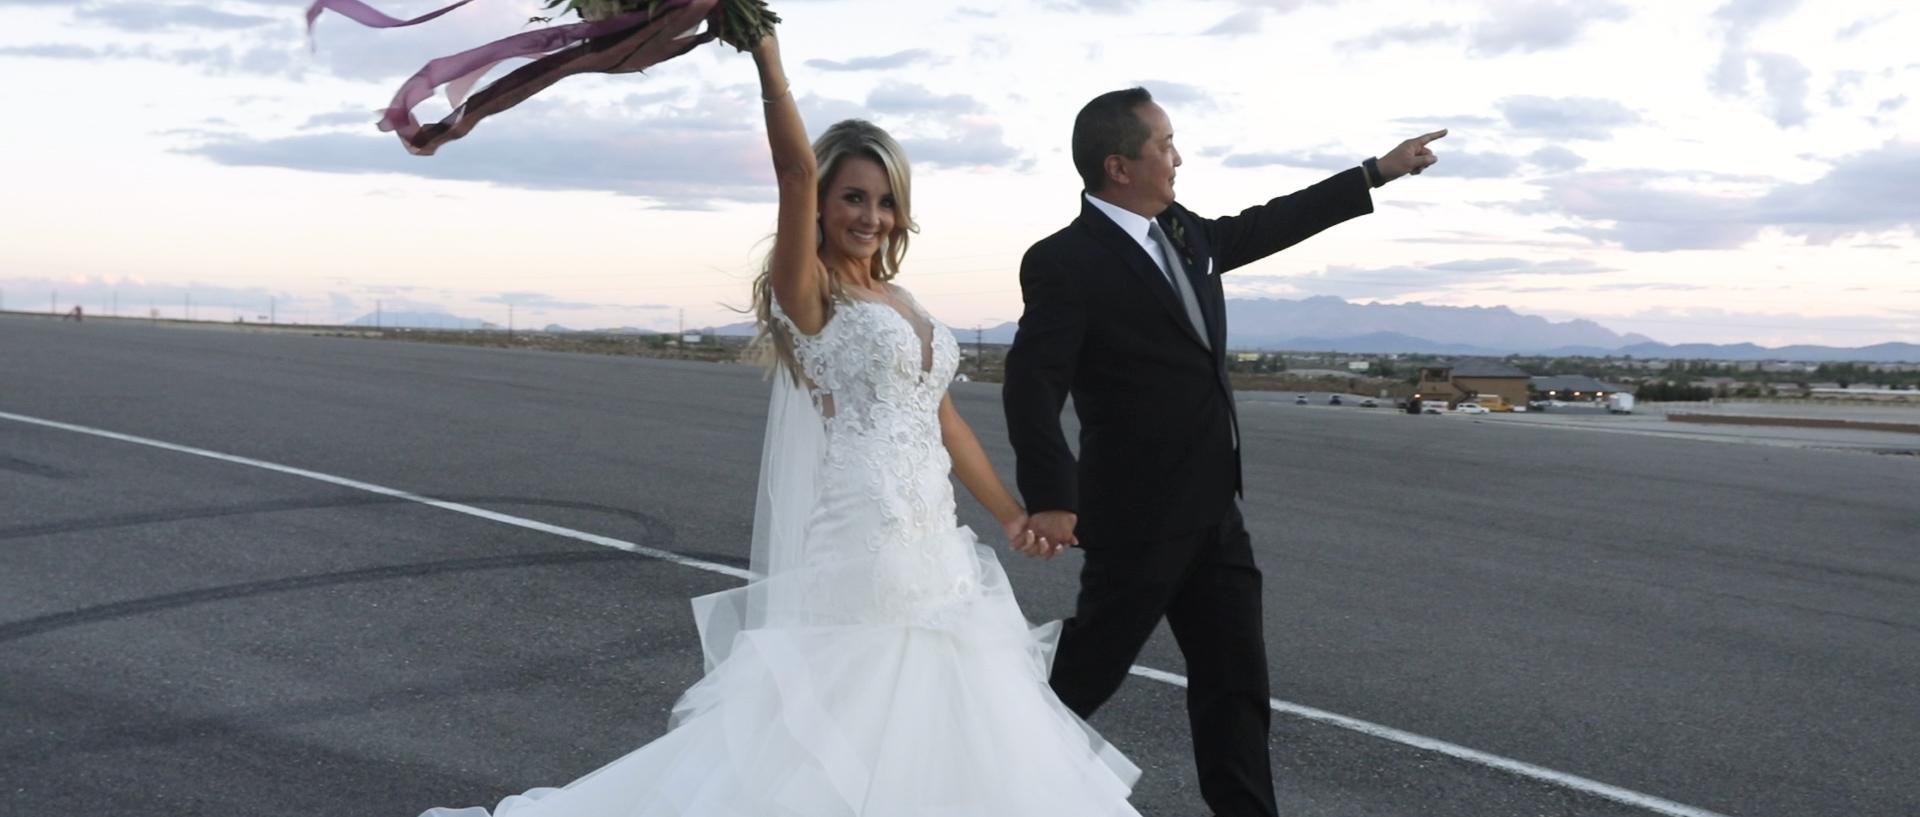 Jessica and Jeffrey Wedding Story.06_41_04_03.Still002.jpg